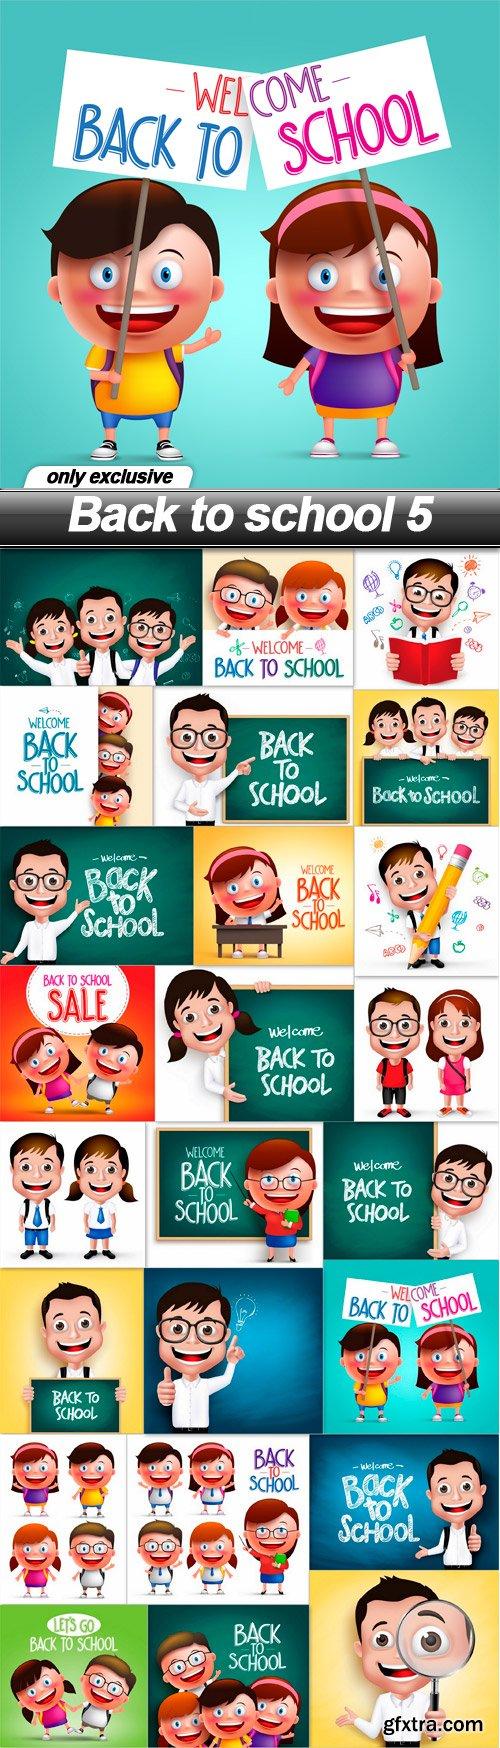 Back to school 5 - 24 EPS